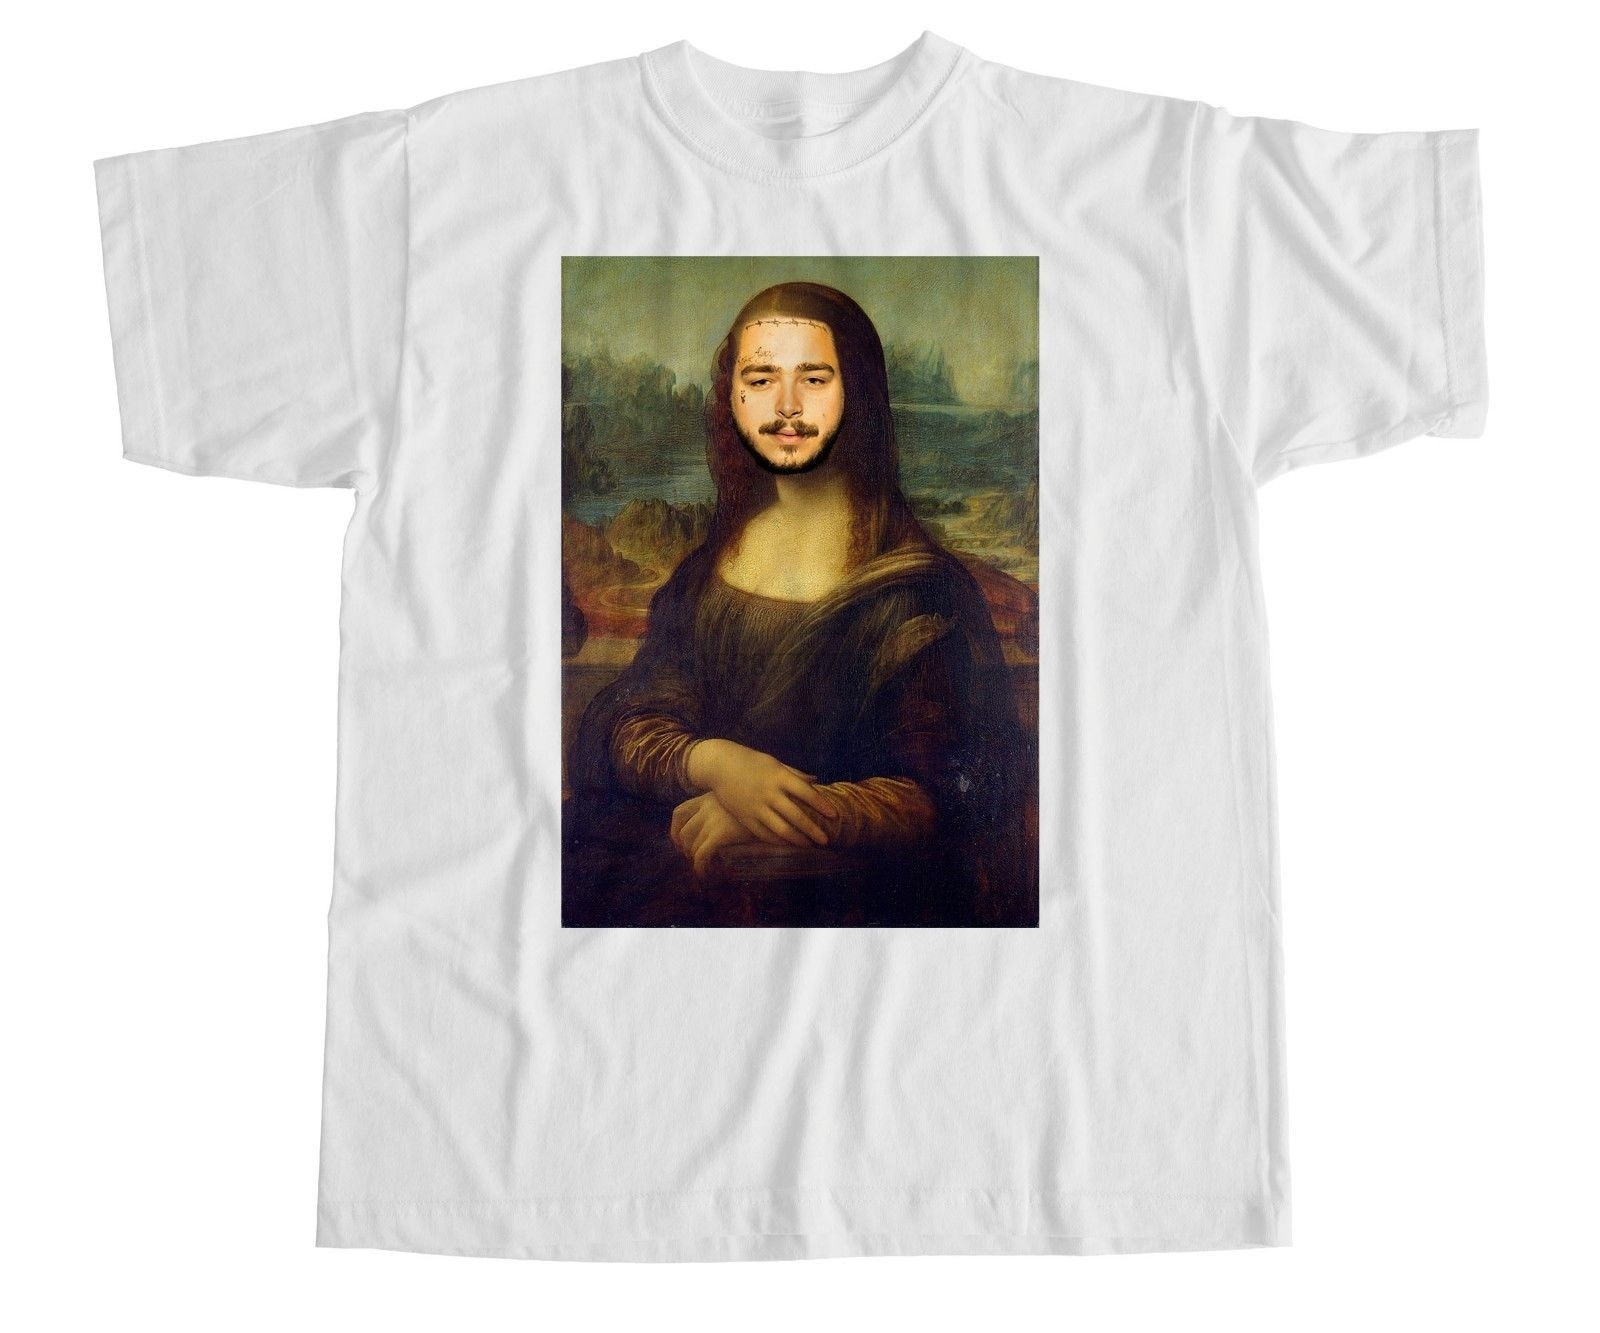 Post Malone Mona Lisa parodia T Shirt Stony blanco Iverson Hip Hop divertido 100% algodón camiseta marca Camisas jeans impresión